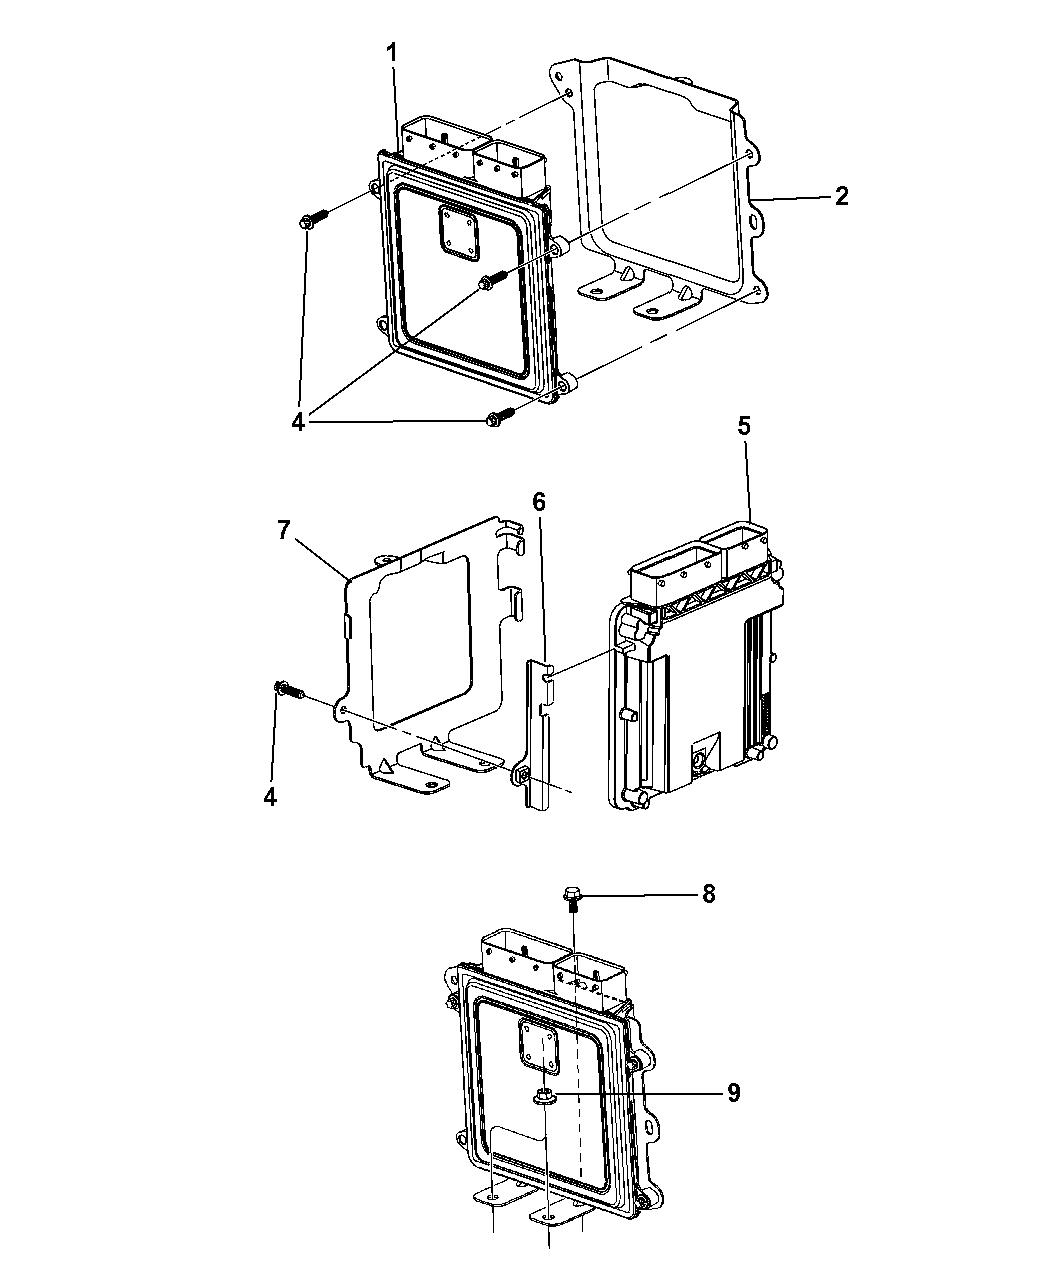 Jeep Compass Powertrain Control Module